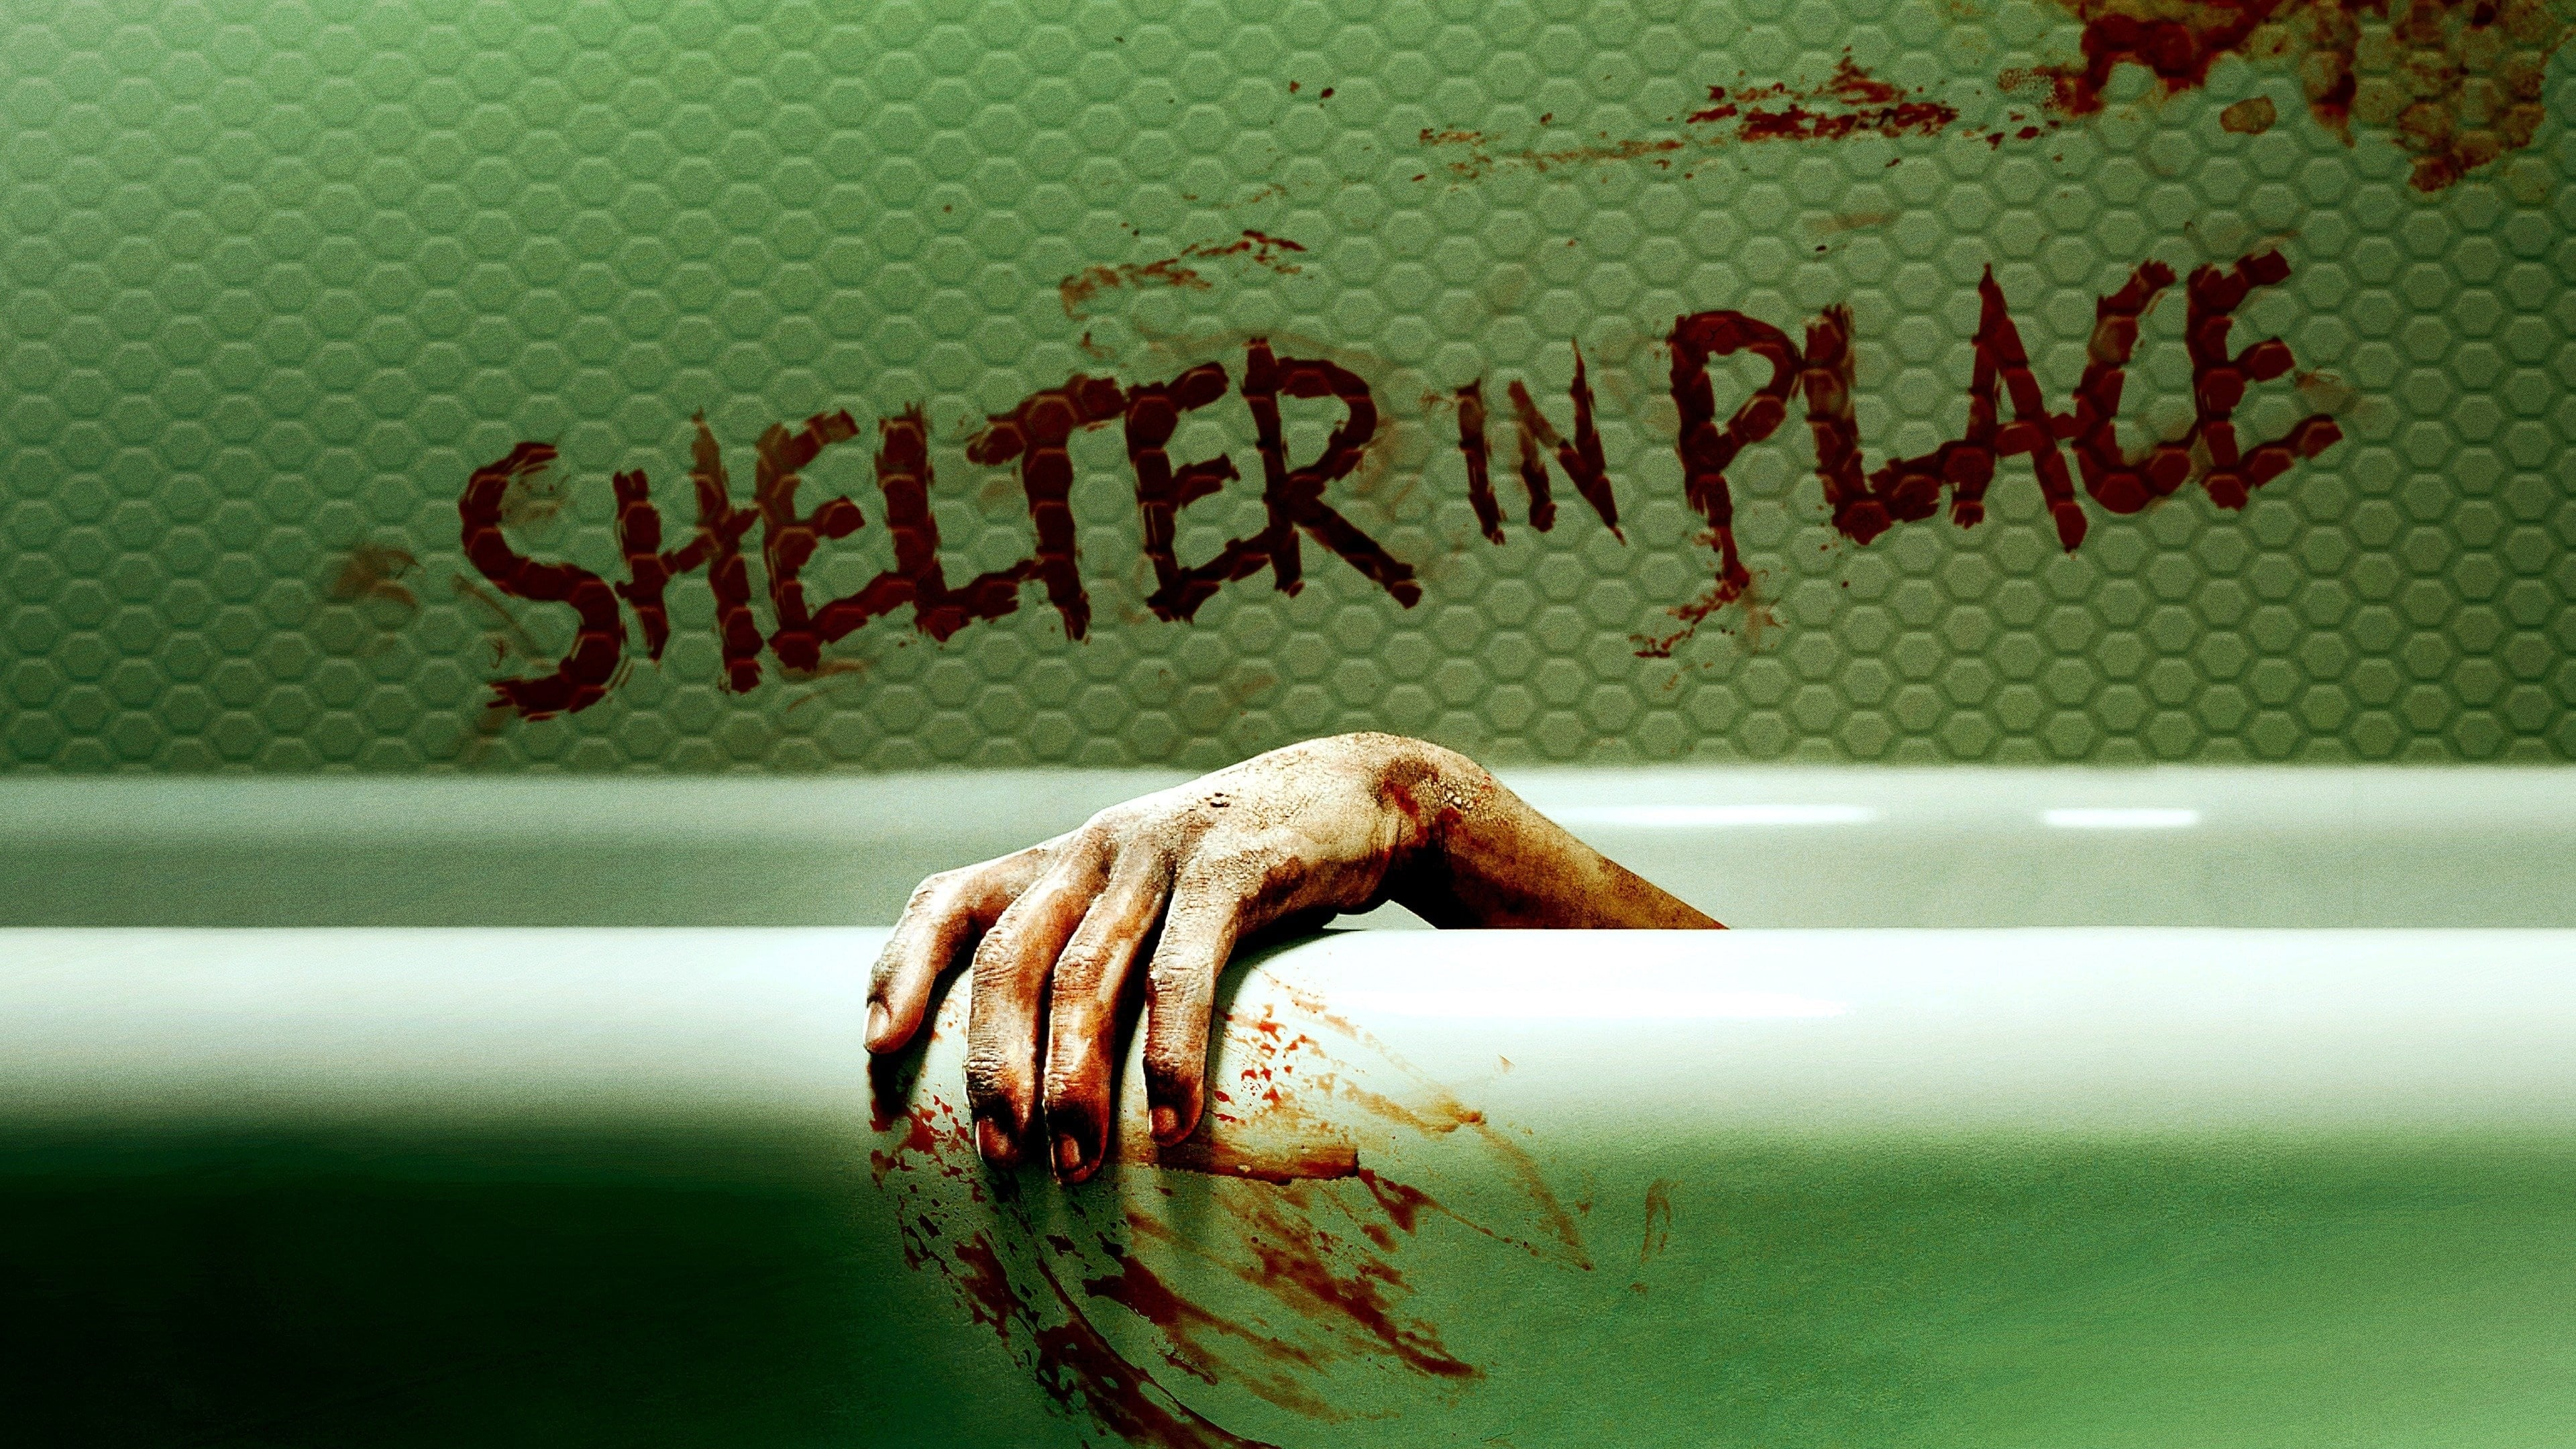 Película Shelter in Place en GNULA